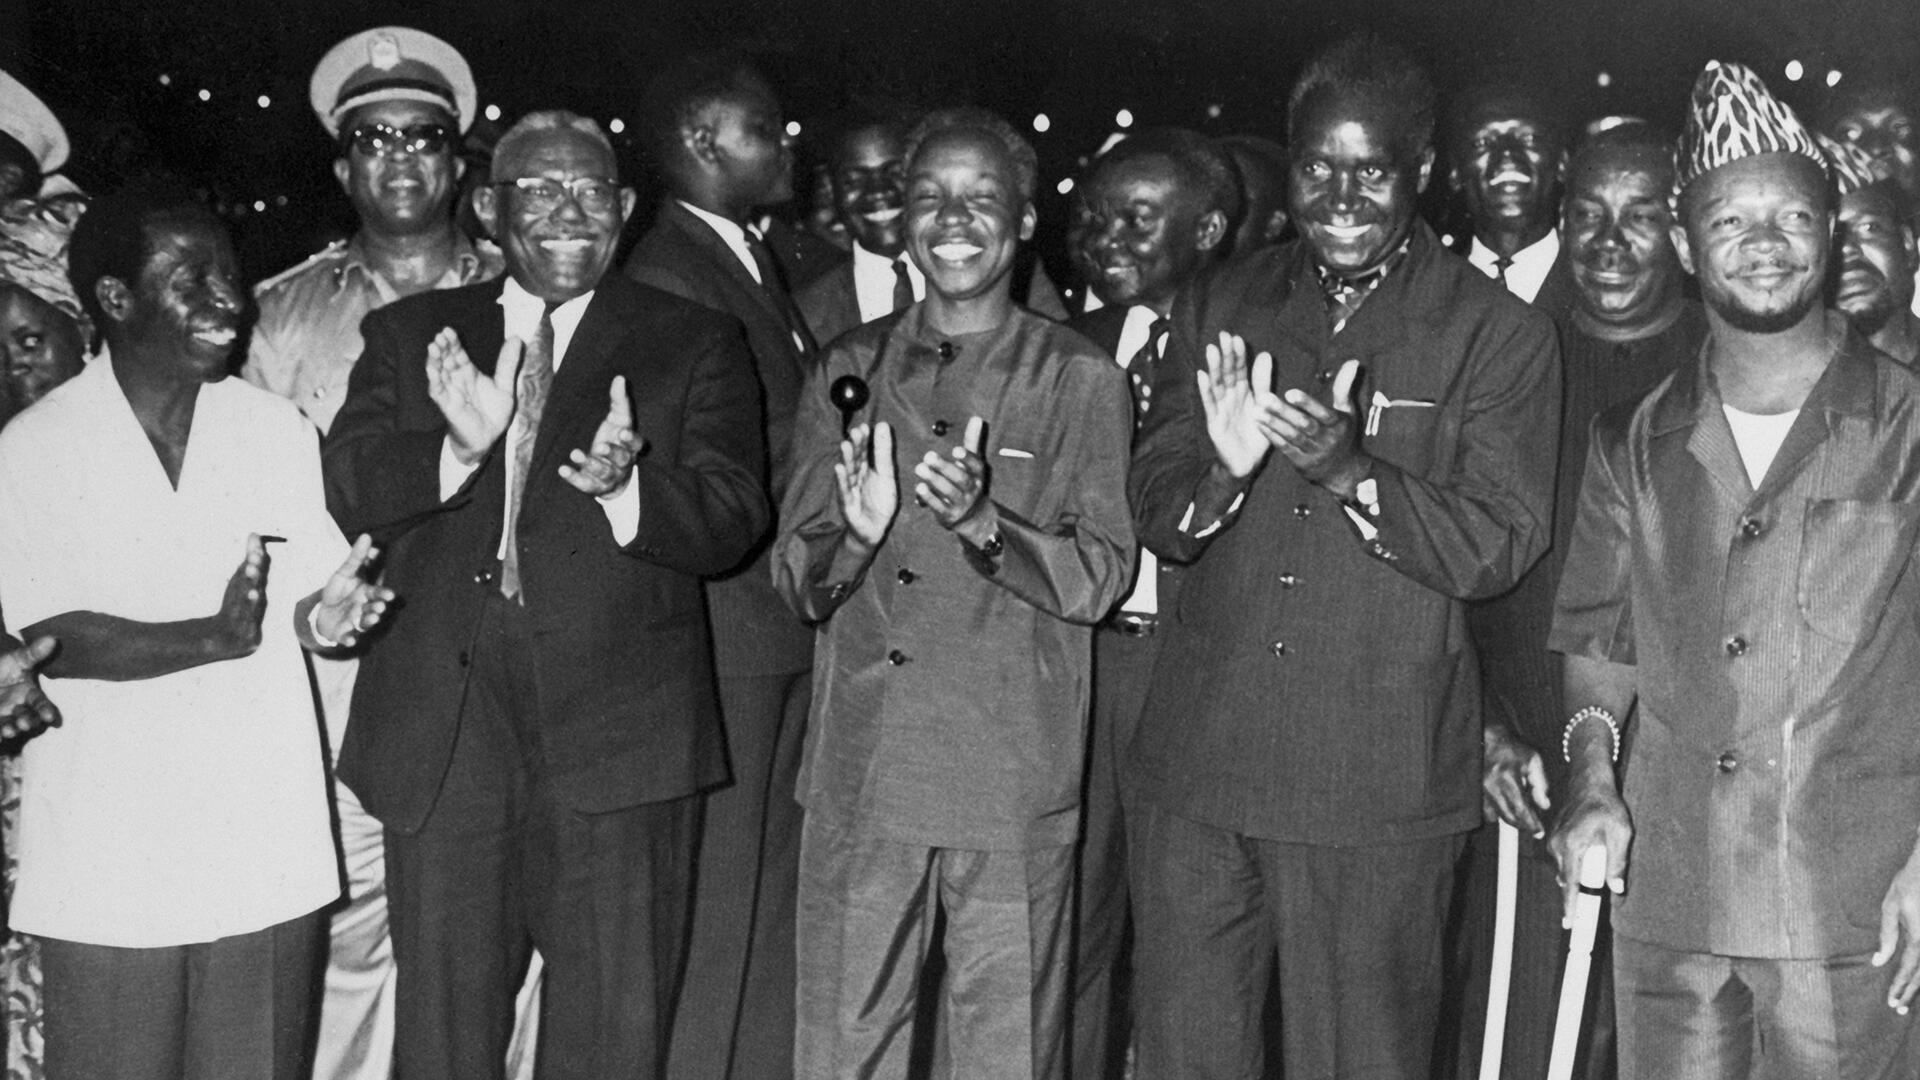 Alphonse Massamba-Débat, Ismaïl al-Azhari, Julius Nyerere, Kenneth Kaunda, Jean-Bedel Bokassa, le 17 mai 1968.